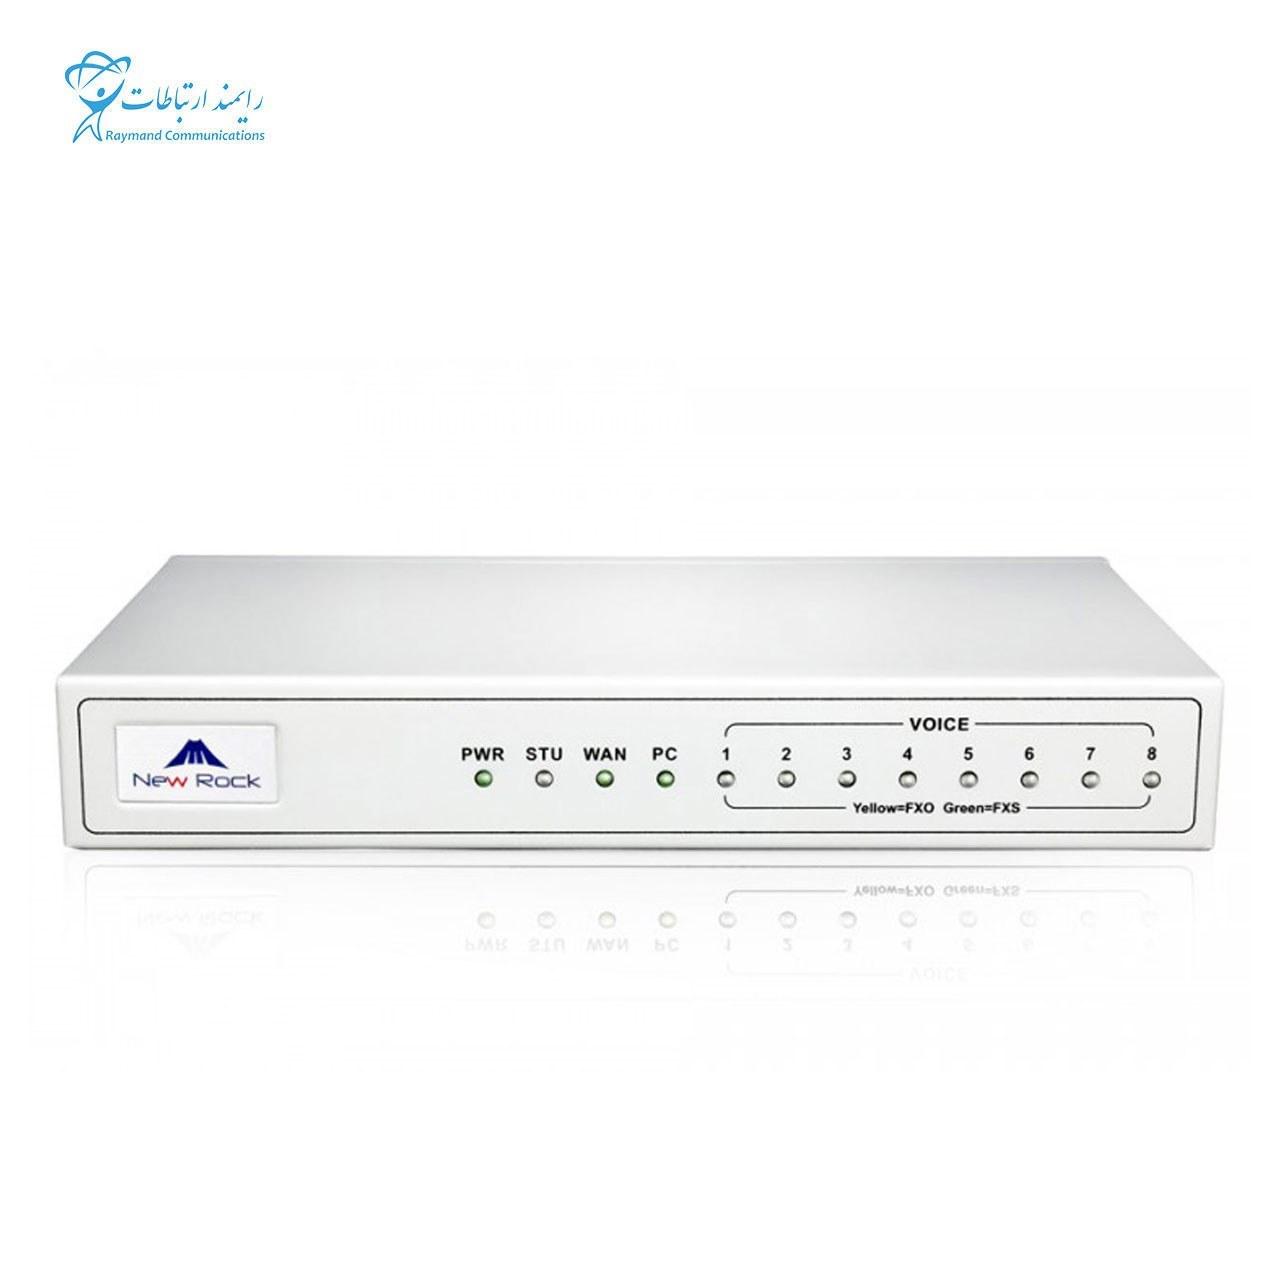 تصویر گیت وی تلفن آنالوگ به آی پی (FXO) نیوراک Newrock MX8G-8FXO Newrock MX8G-8FXO Analog IP Phone (FXO) Gateway